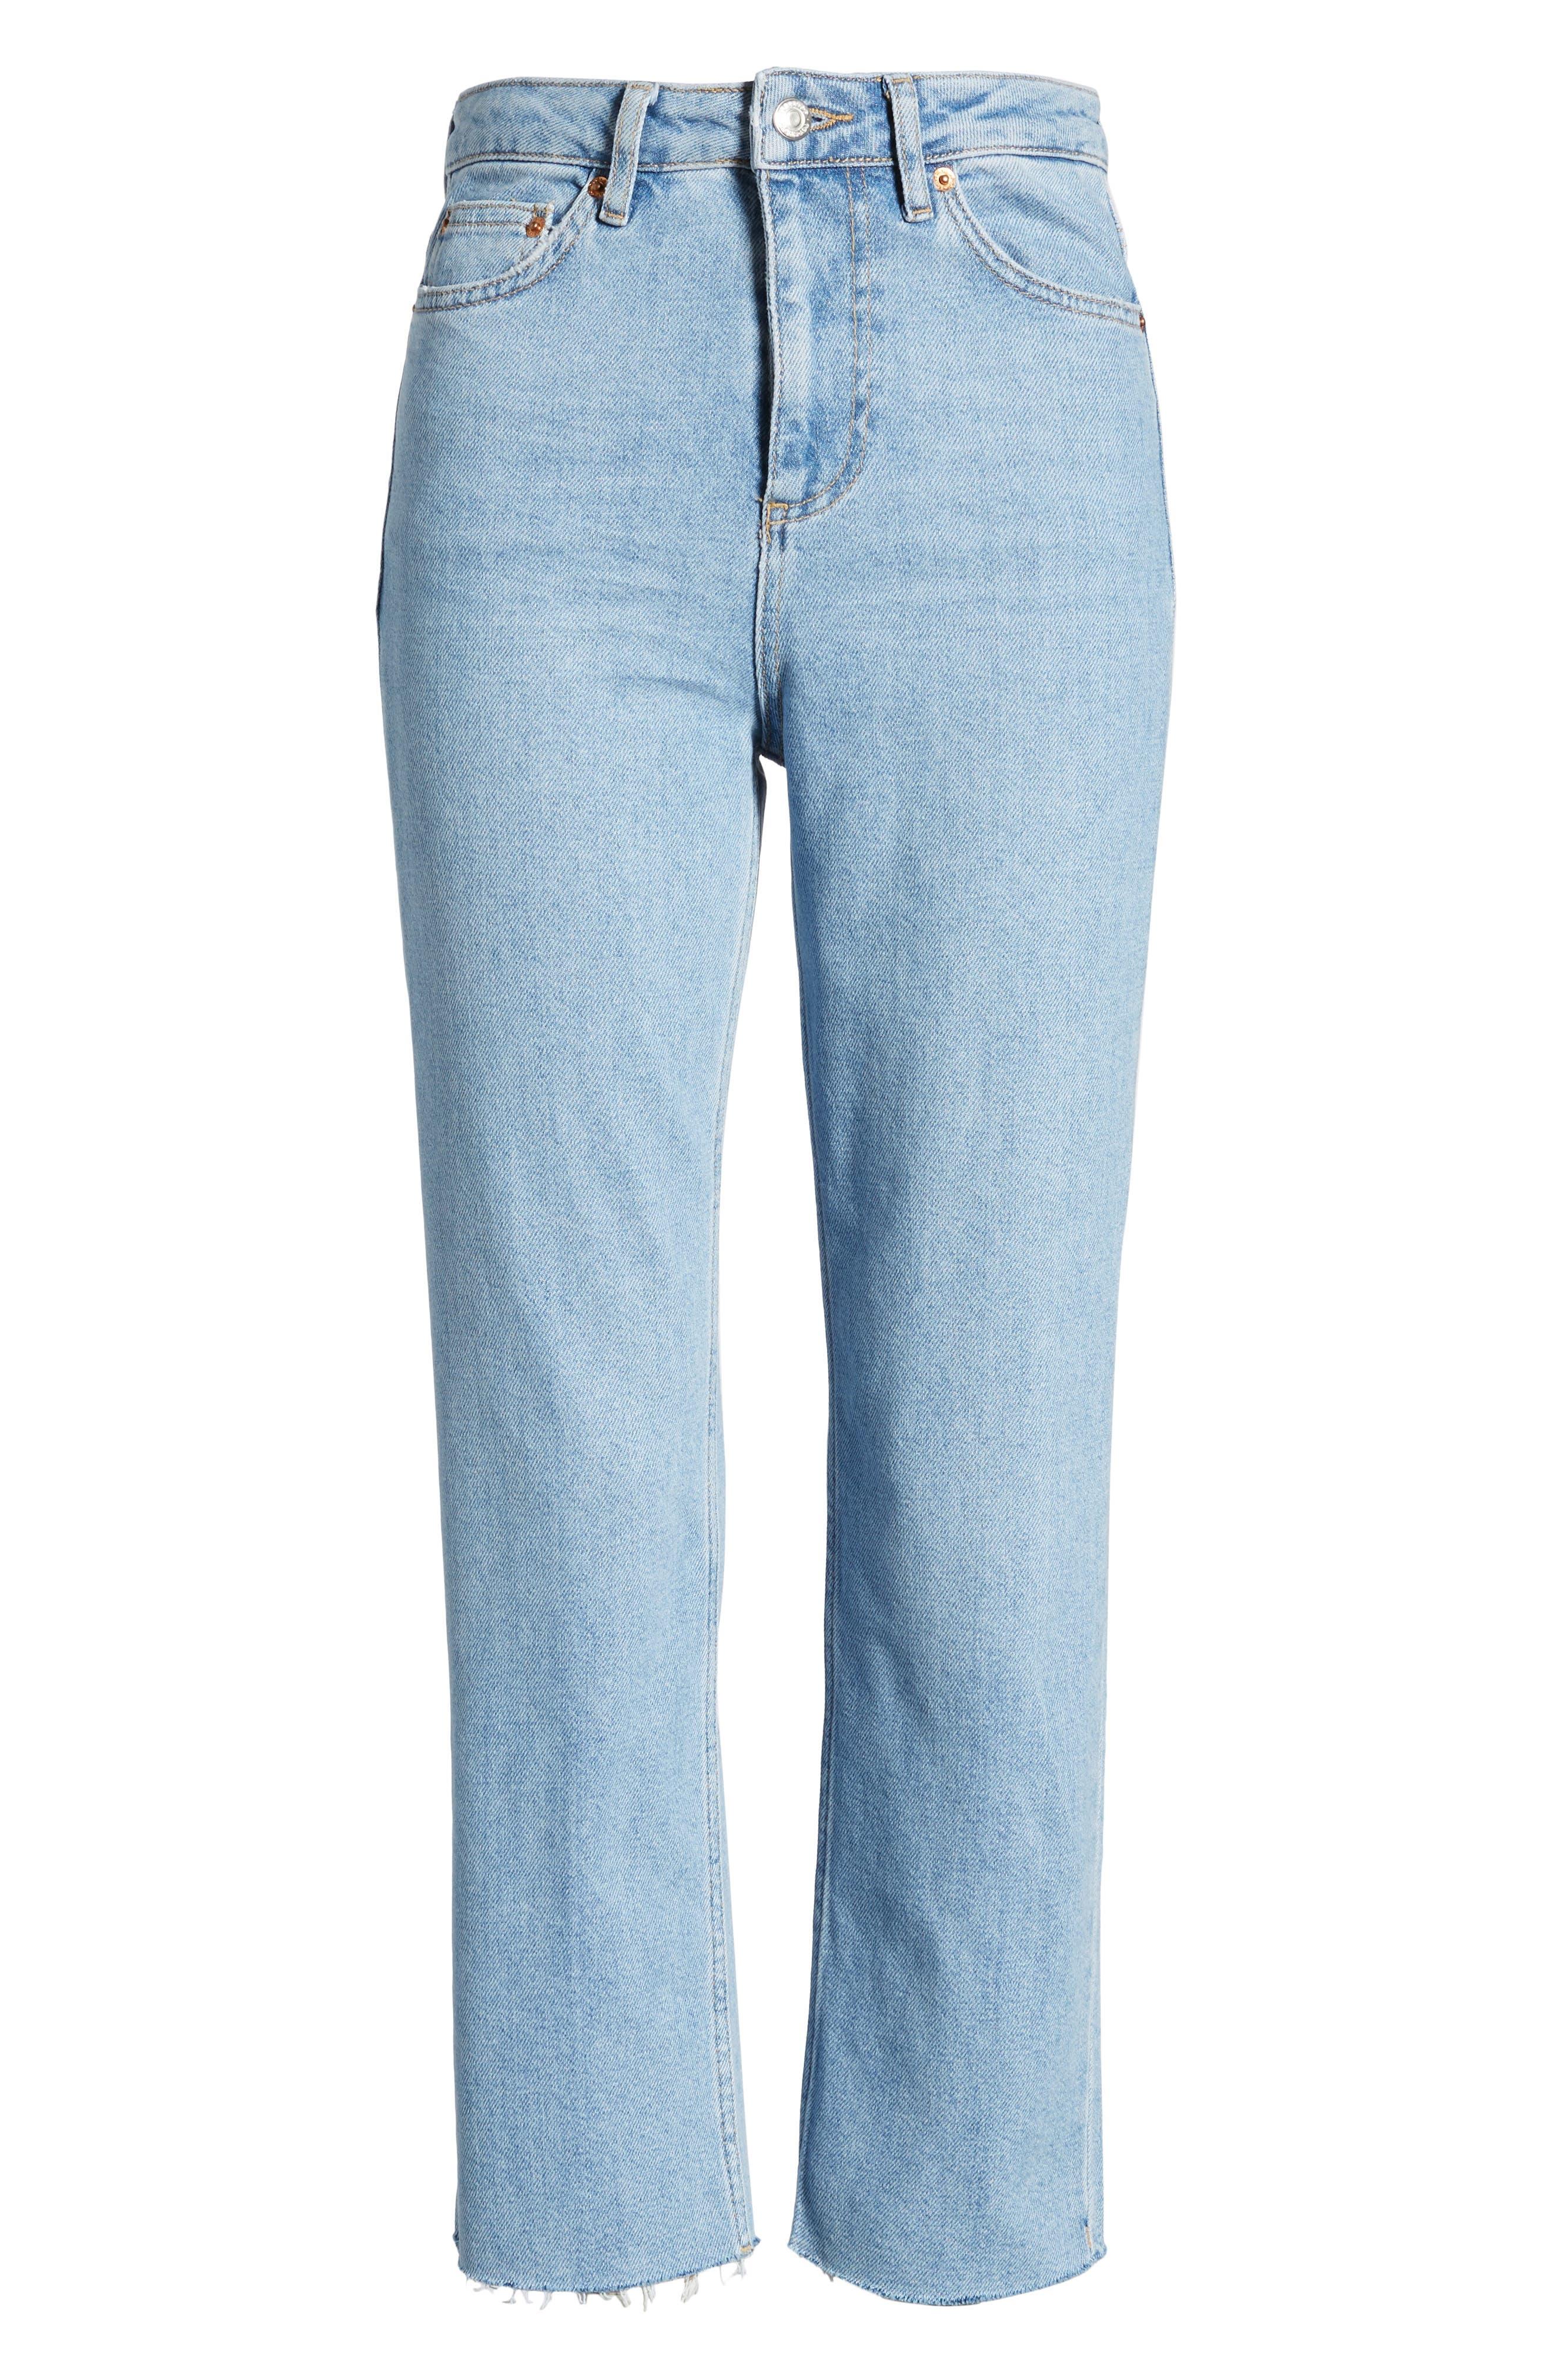 Raw Hem Straight Leg Jeans,                             Alternate thumbnail 7, color,                             BLEACH STONE DENIM